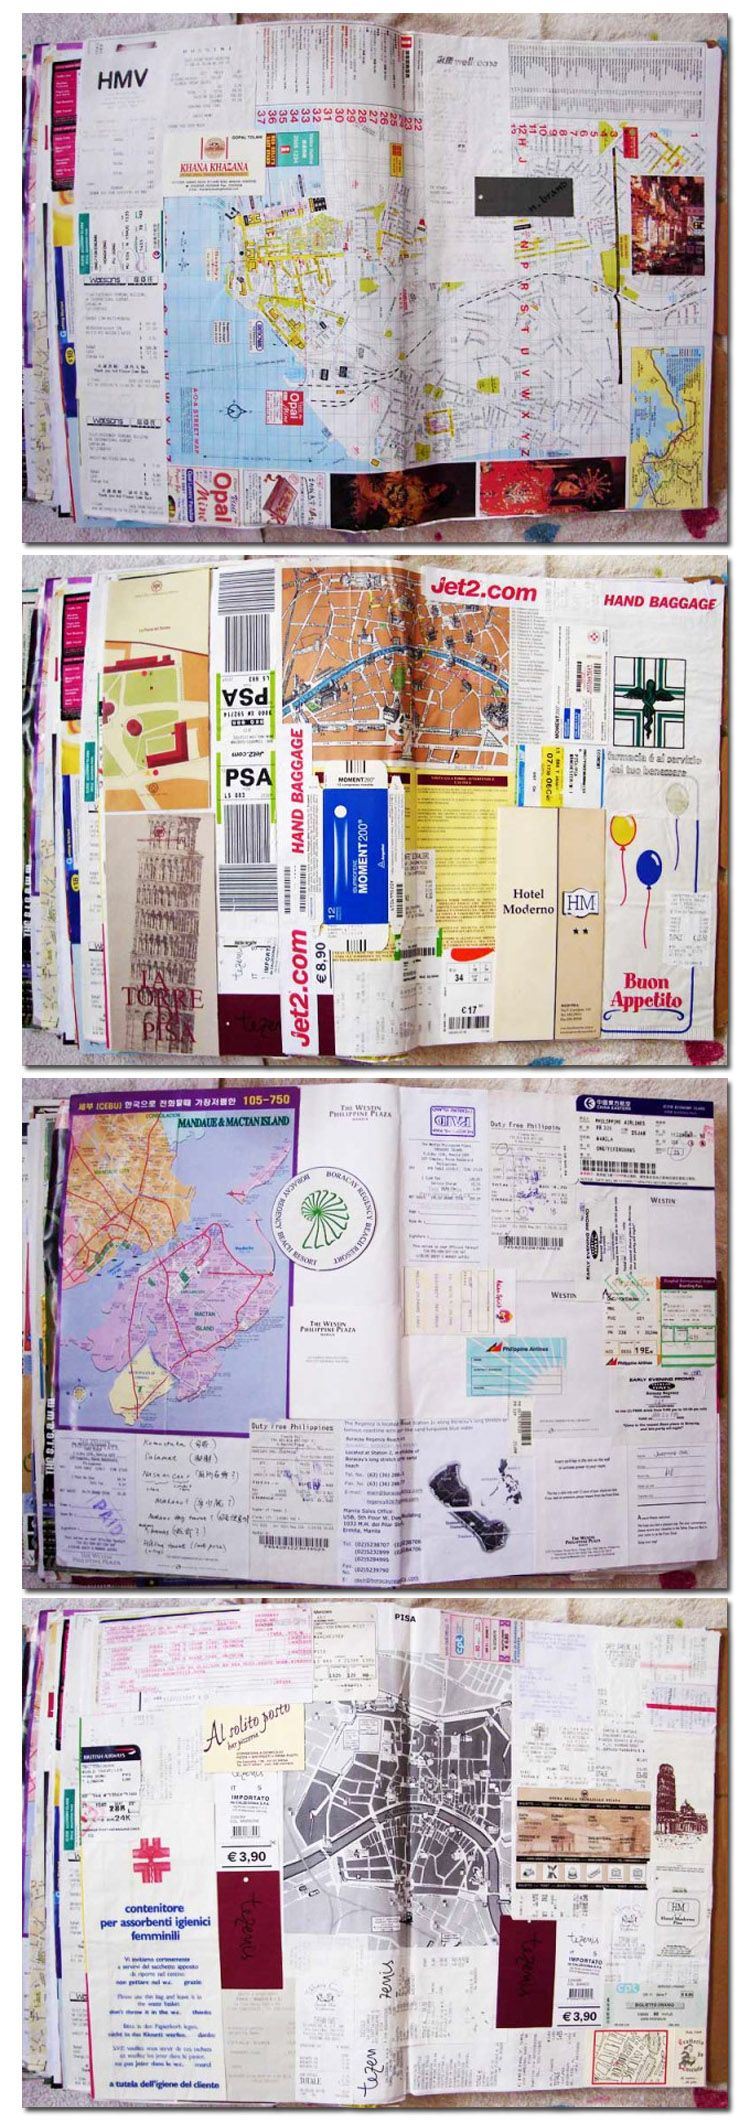 Scrapbook ideas about yourself - Travel Scrapbook Idea Http Shantihshalaholisticarts Com Global Travel Scrapbook